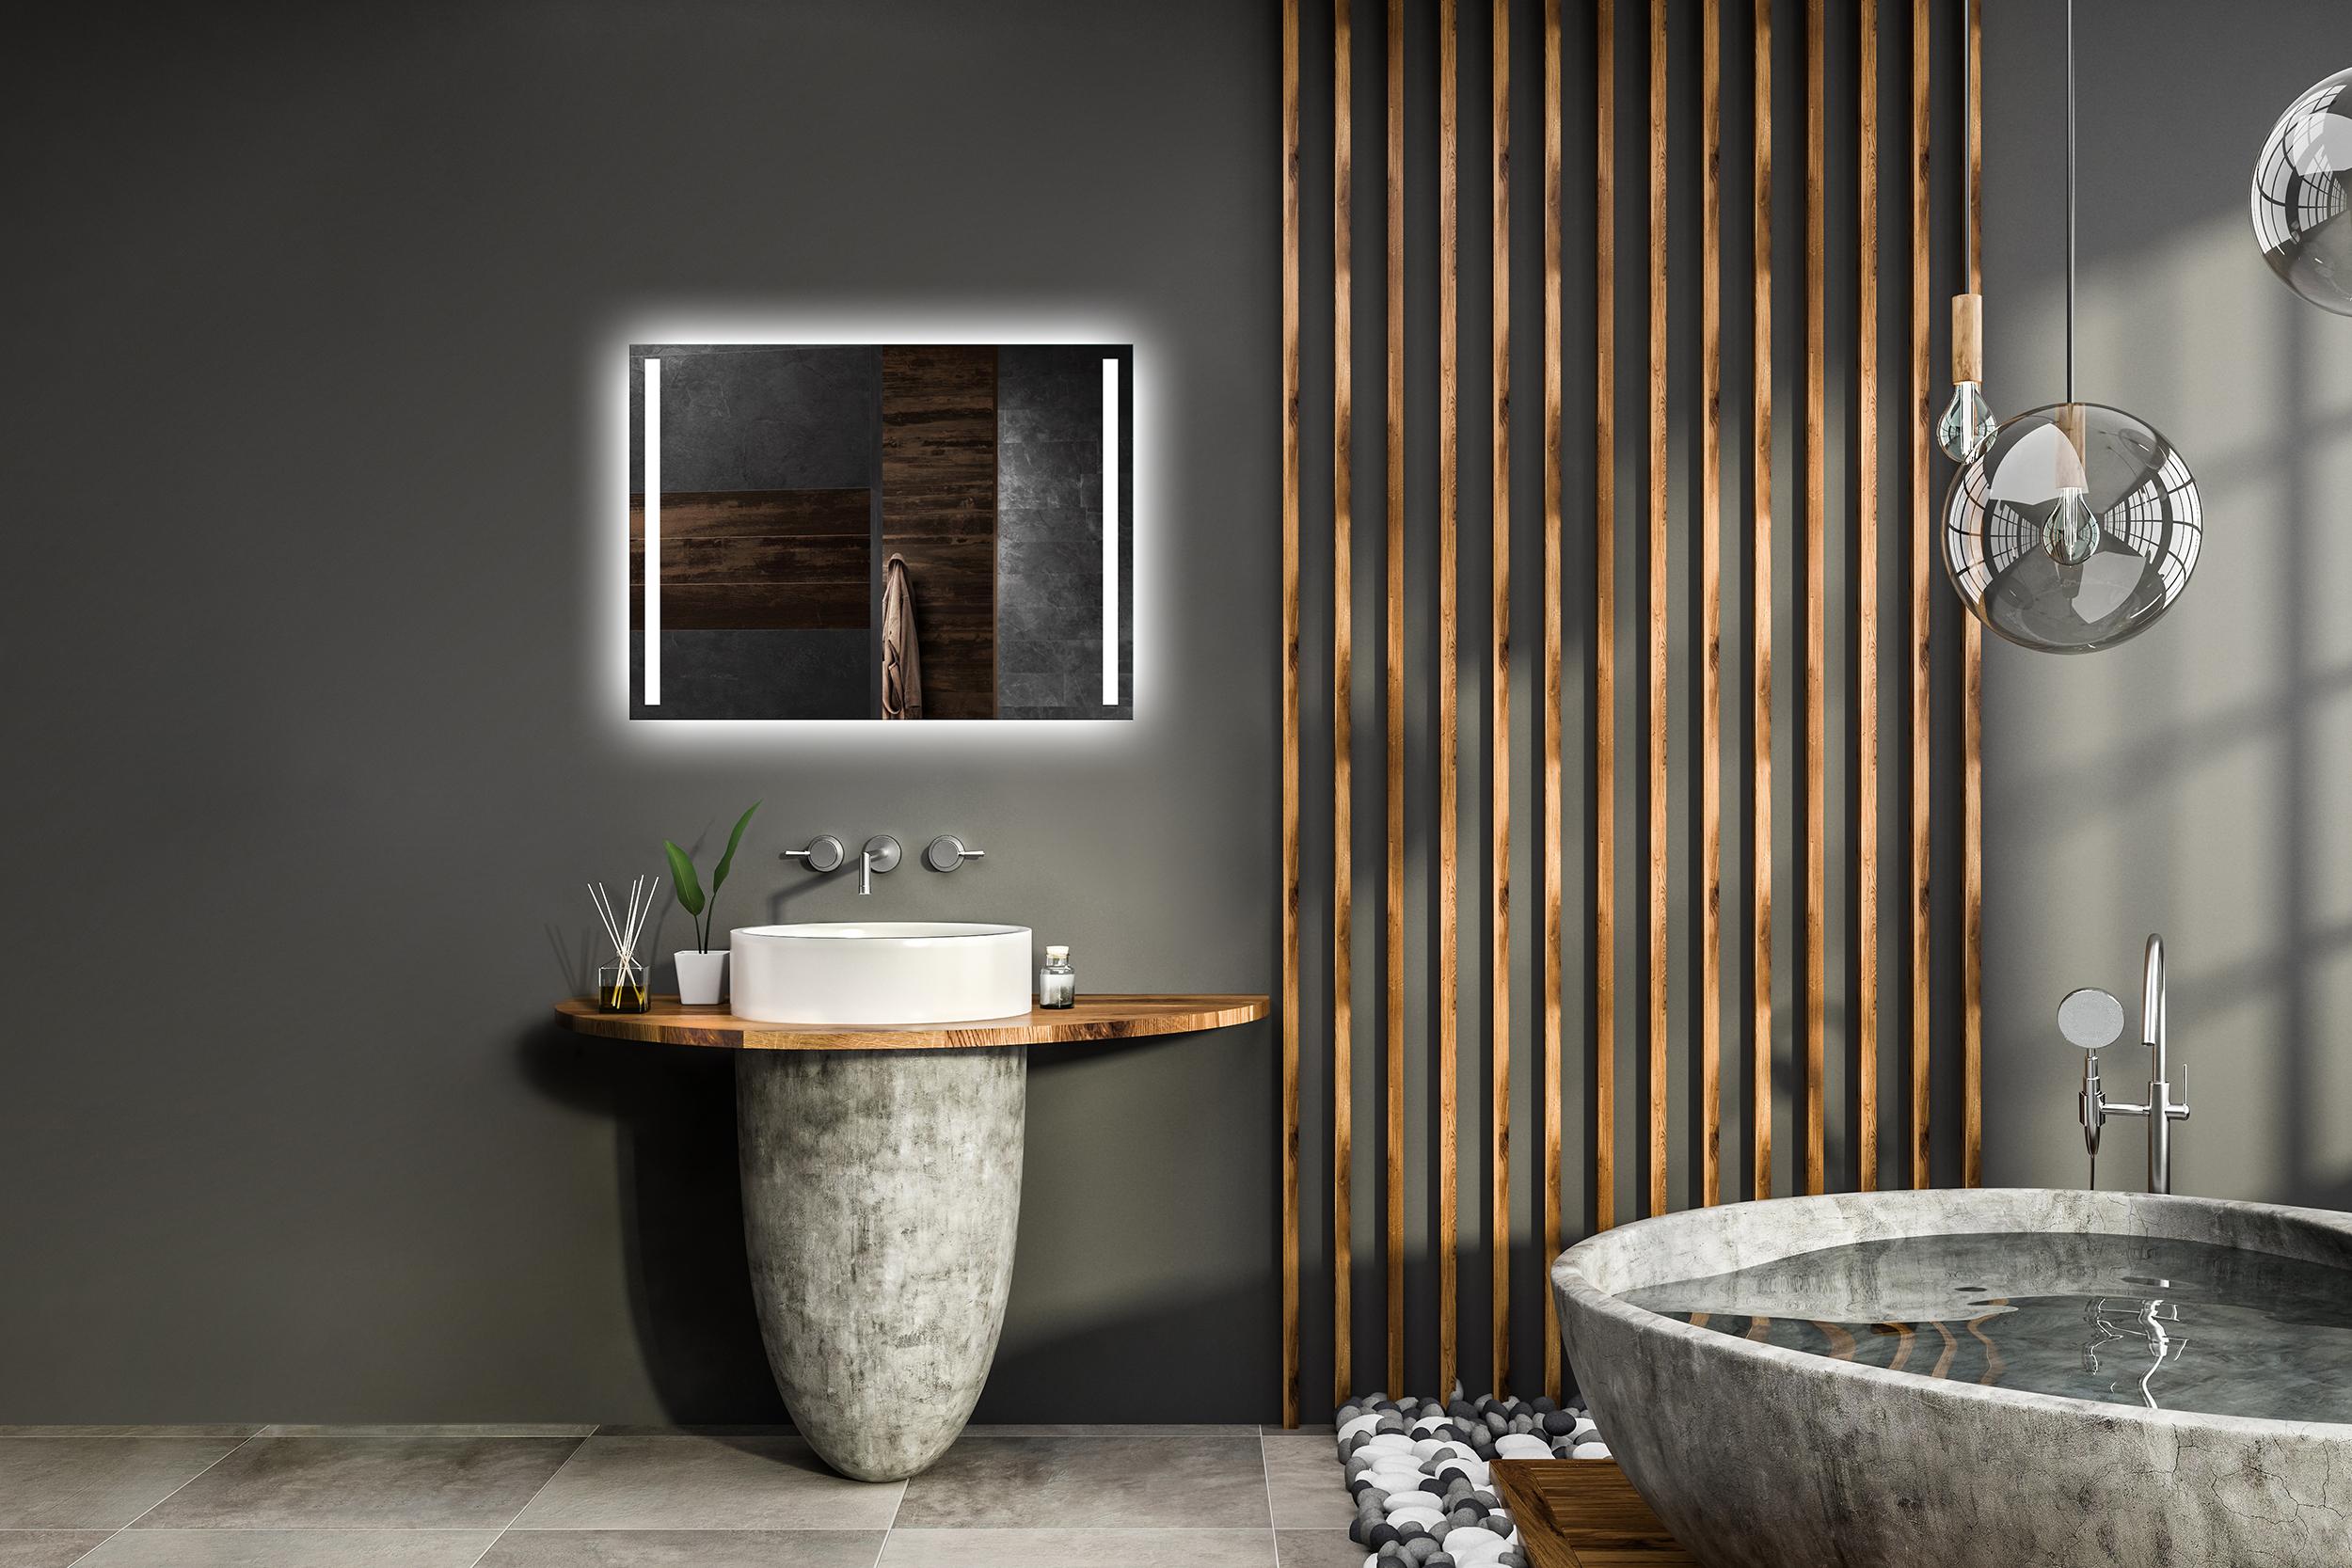 Paket Led Badspiegel Beleuchtung Sensor Schalter Hollywood Wandspiegel Beleuchtet